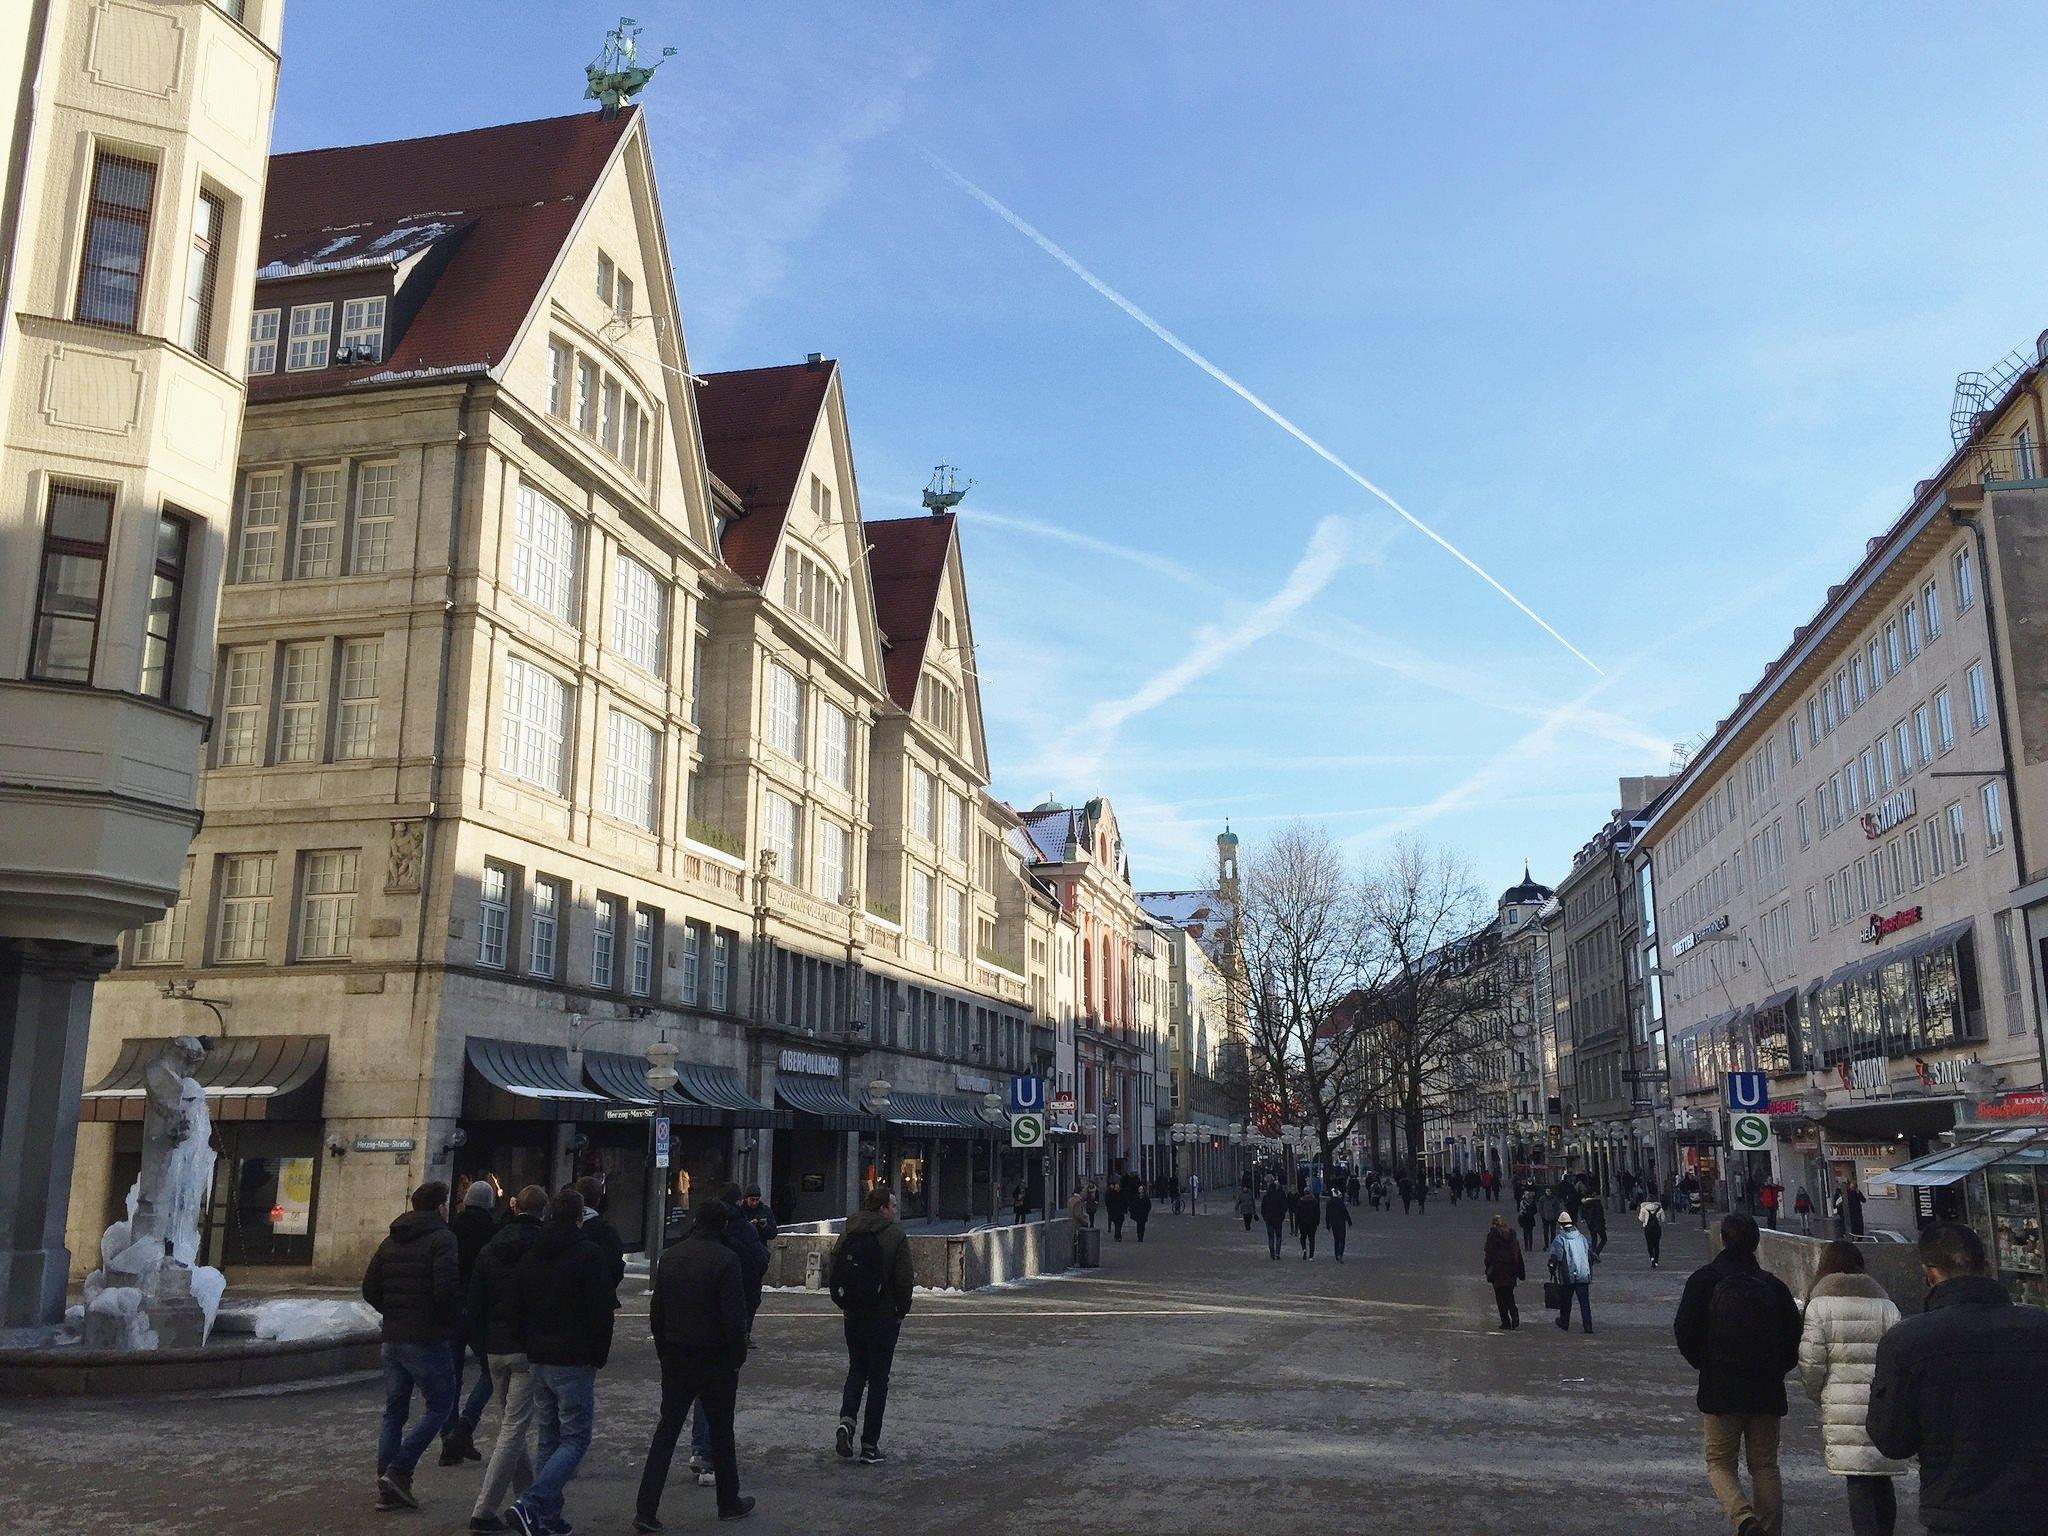 Munich public street